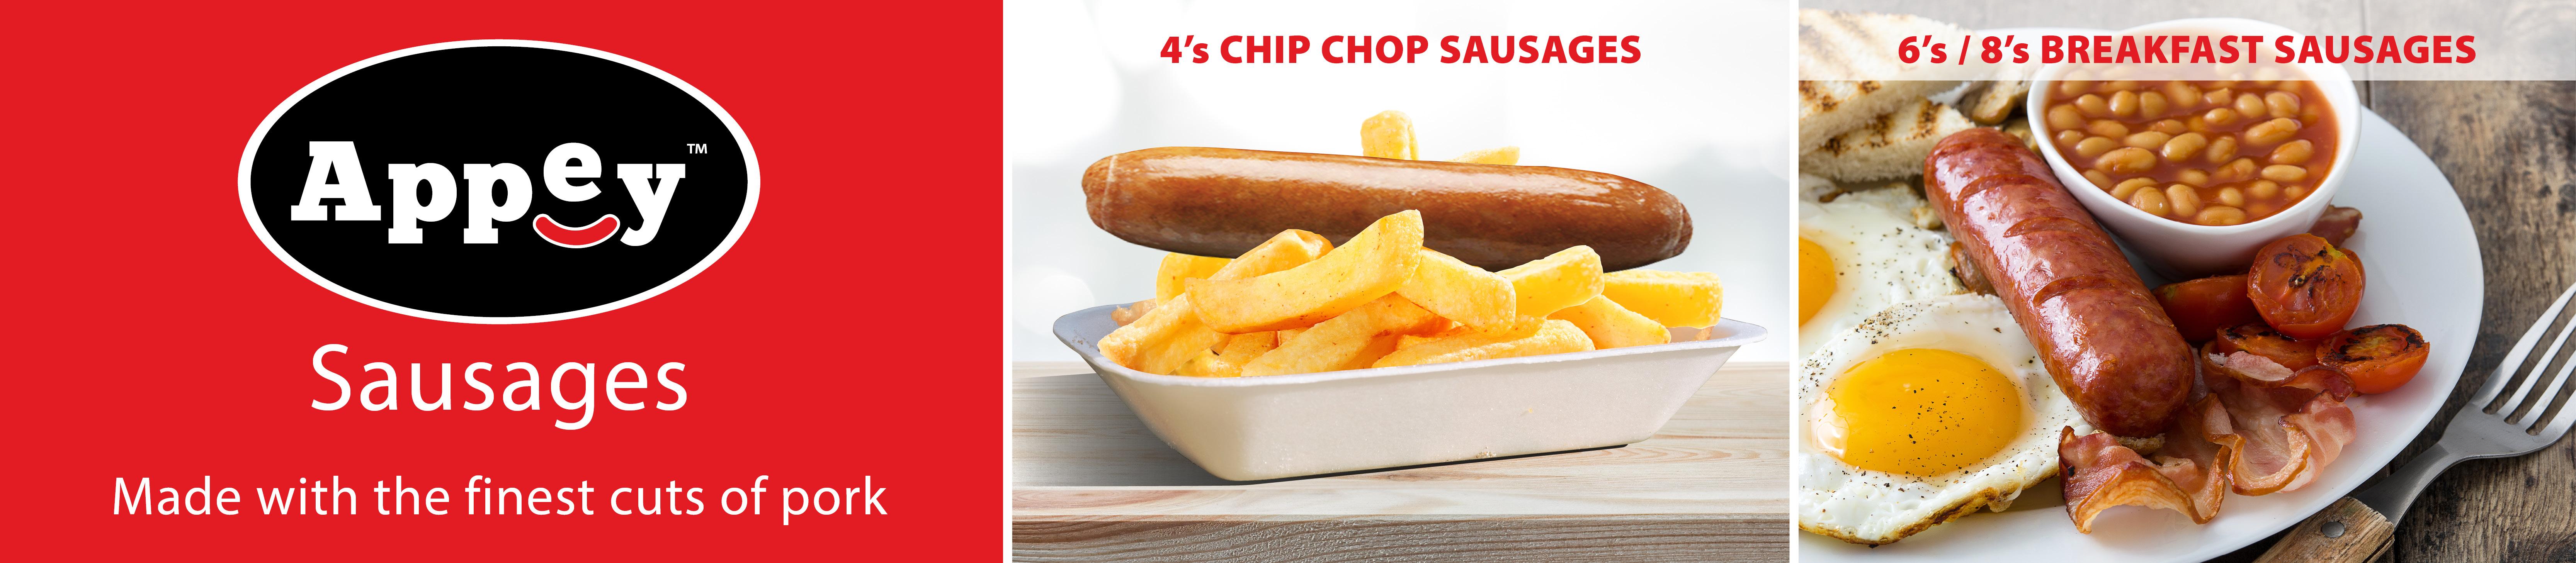 Appey Sausages